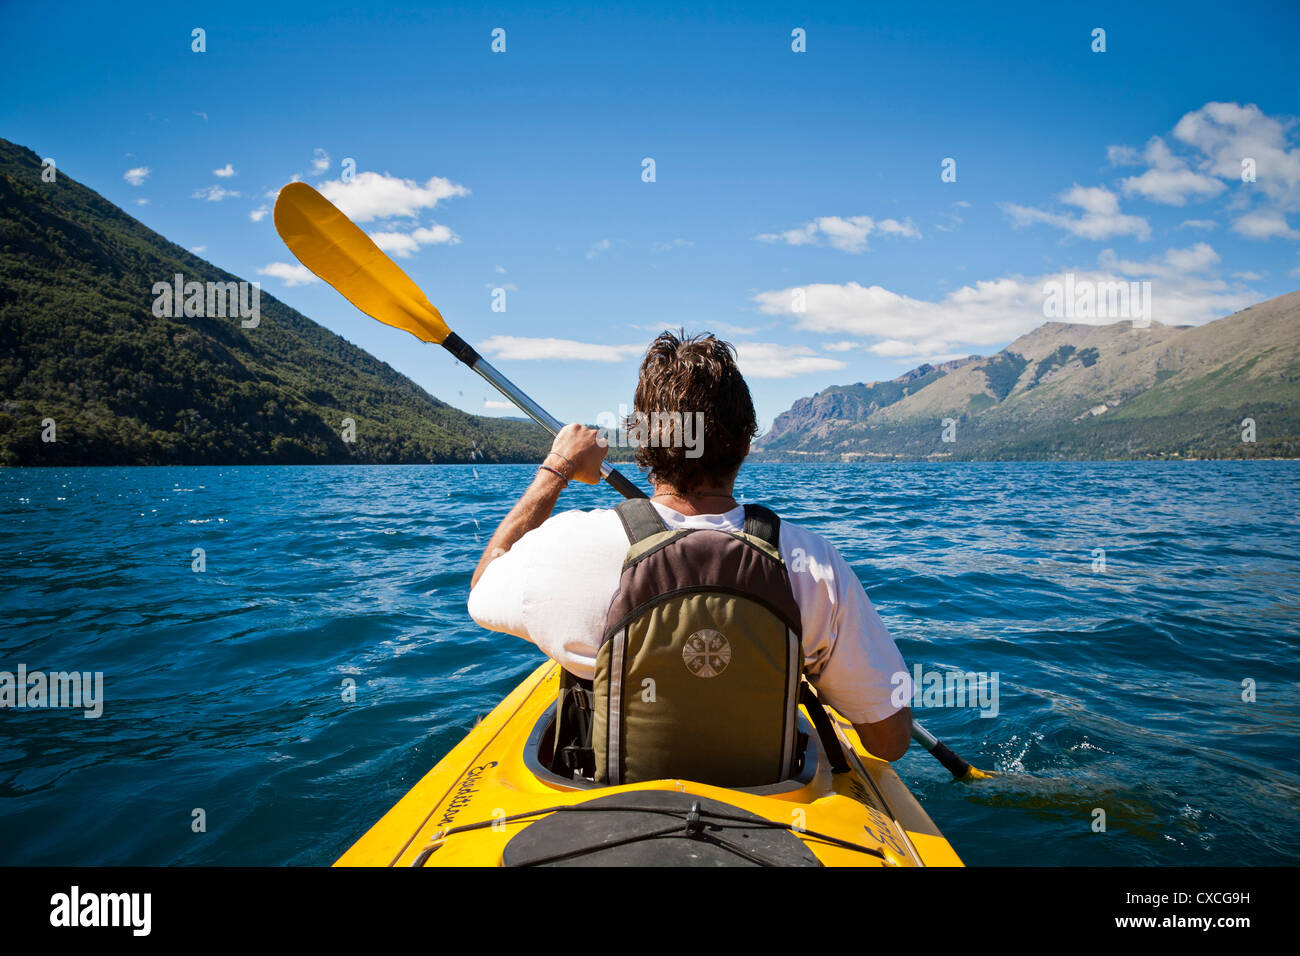 Kayakying al lago Guttierez nella estancia Peuma Hue, distretto dei laghi, Patagonia, Argentina. Immagini Stock